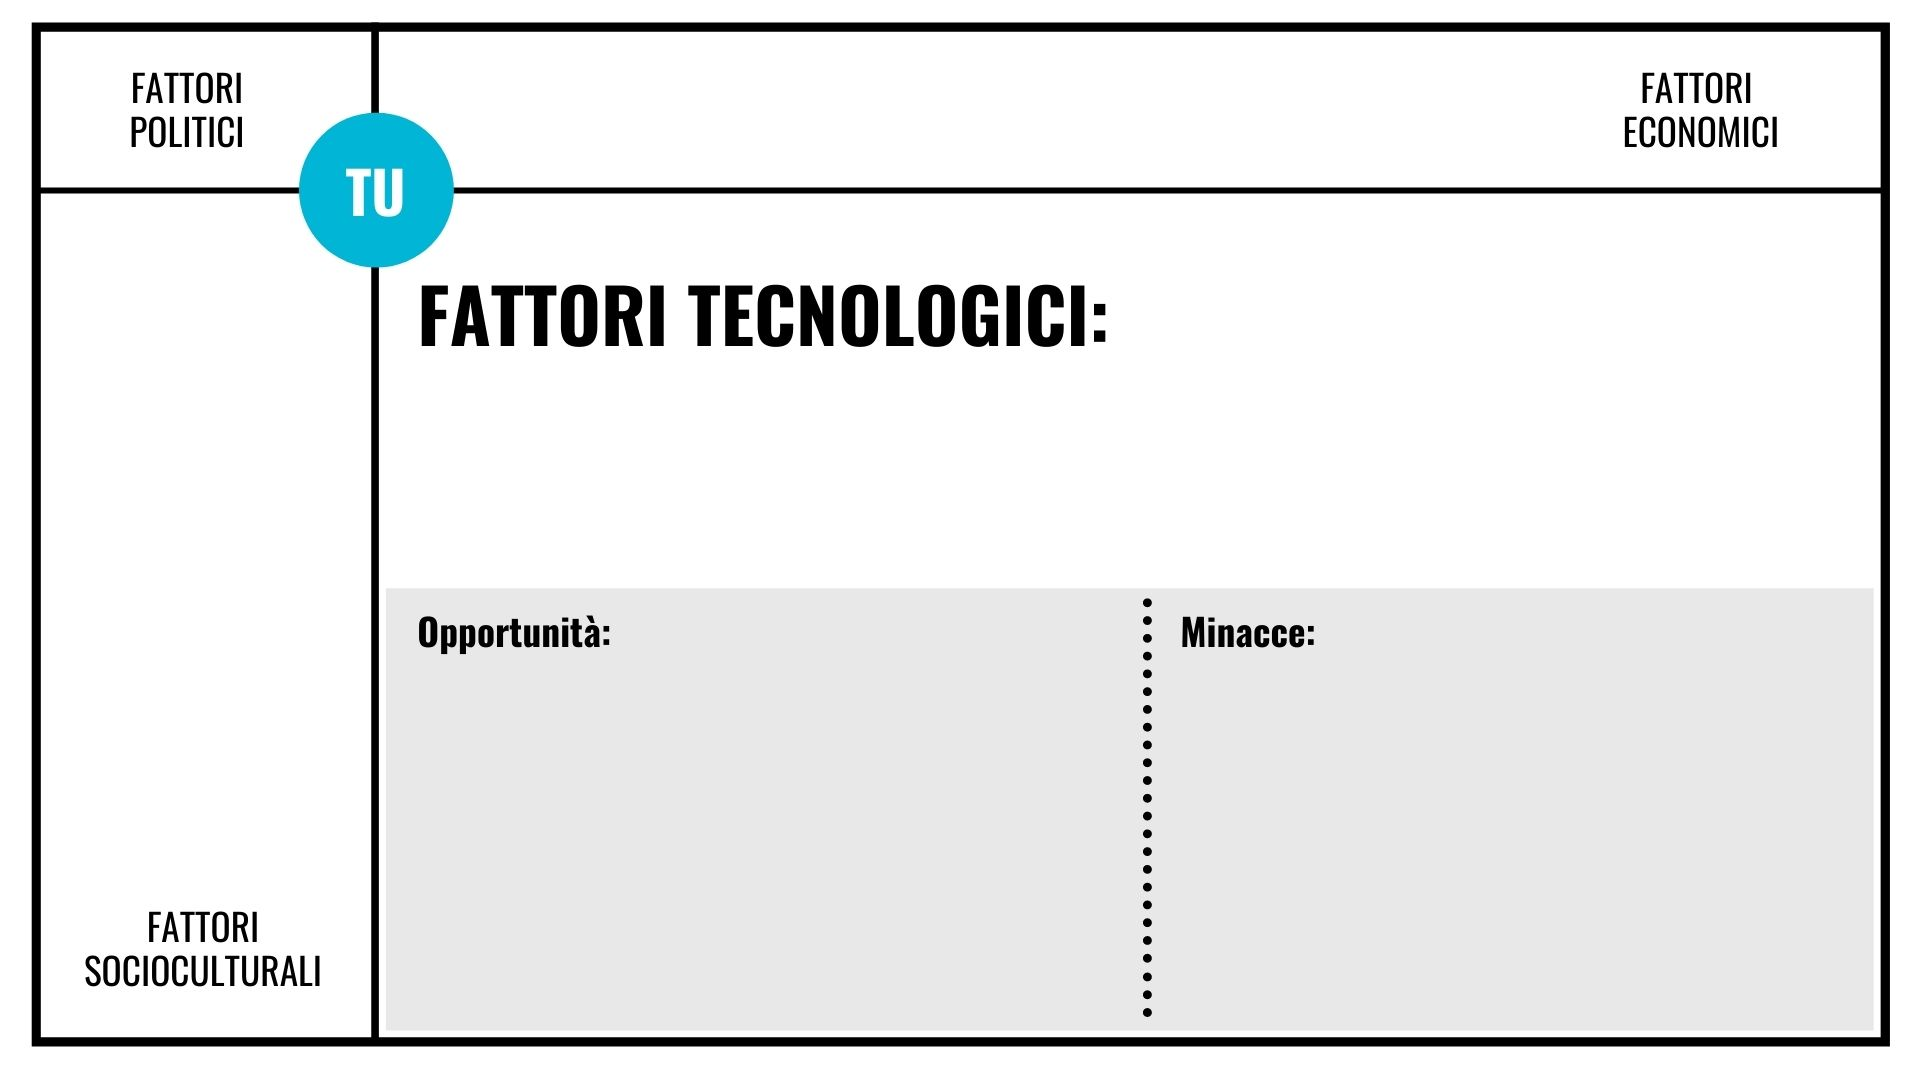 Matrice analisi PEST Fattori tecnologici